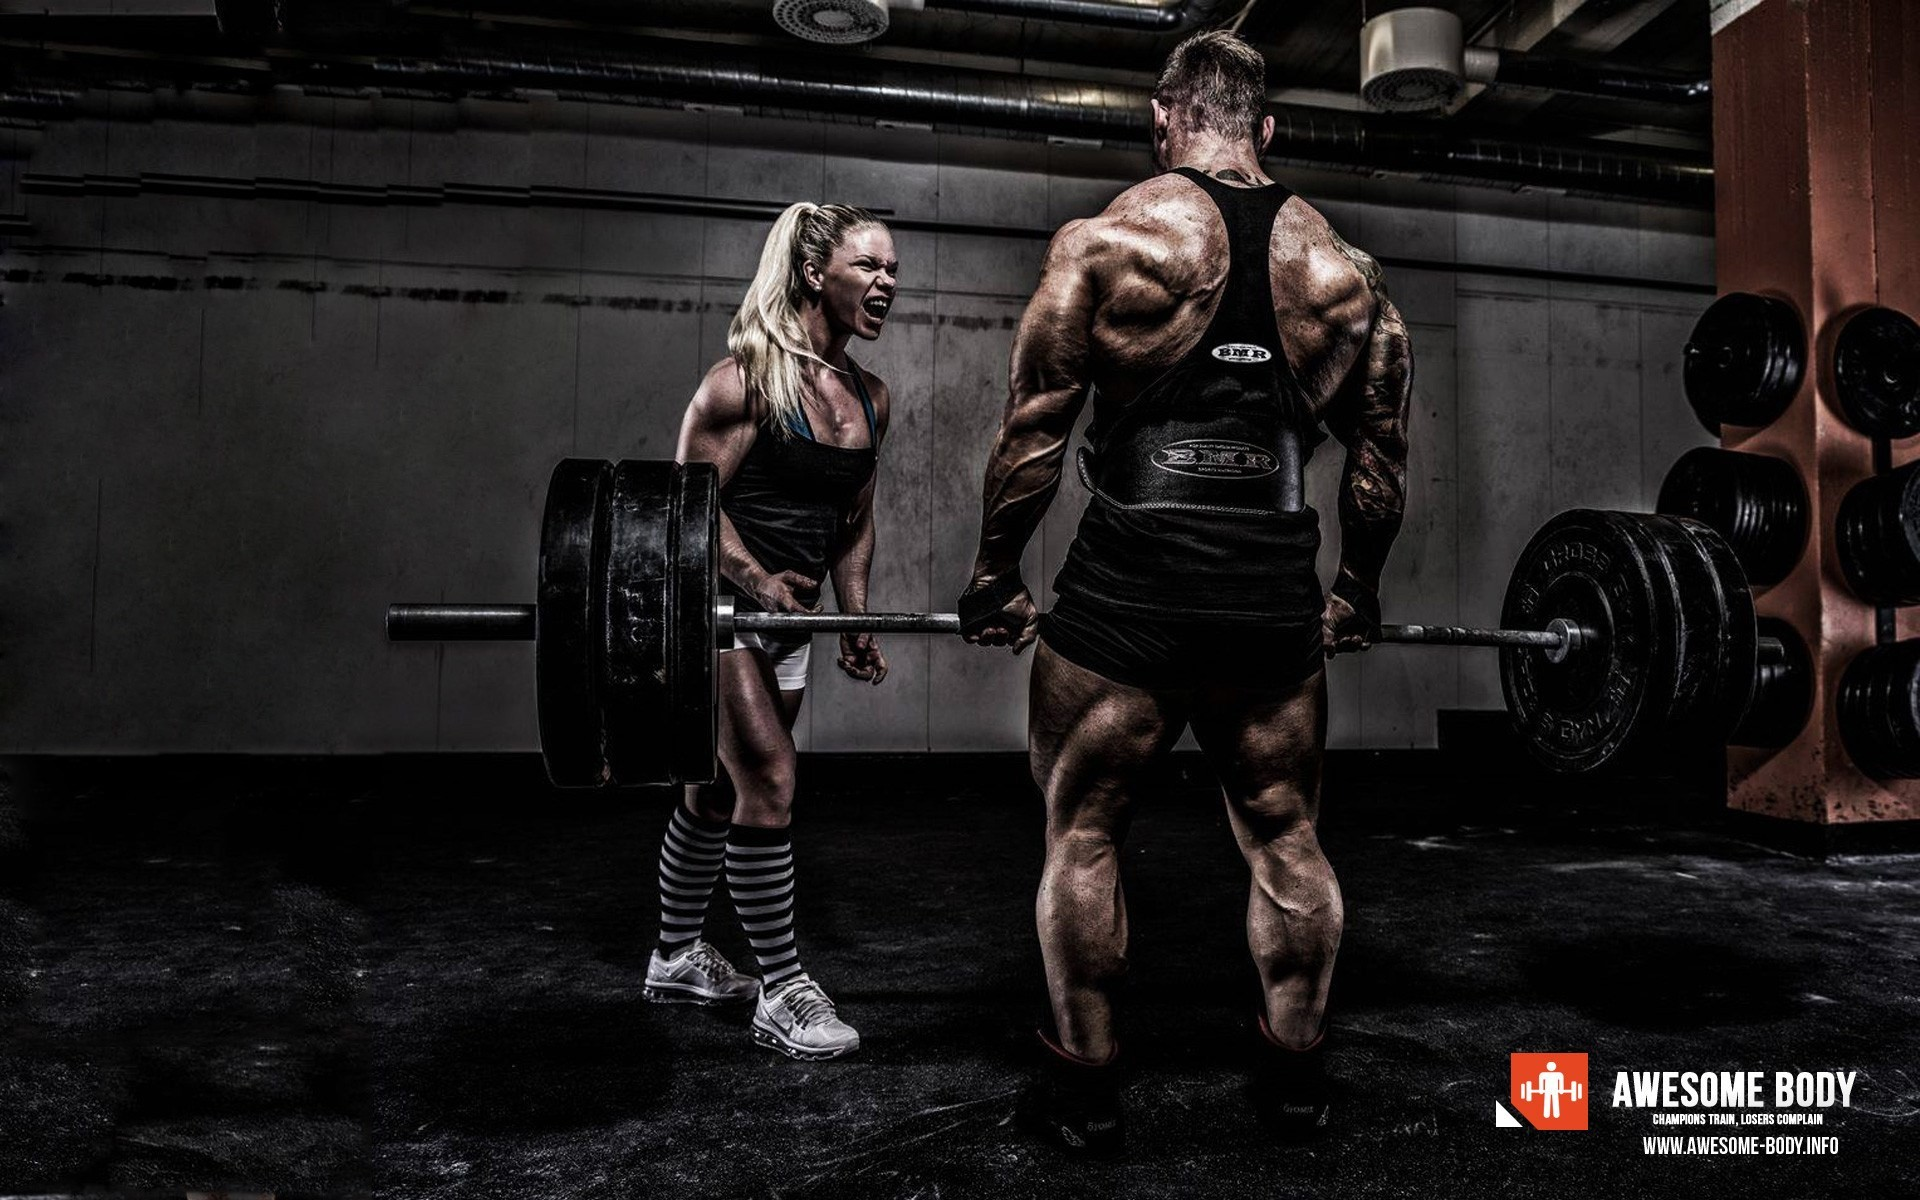 widescreen wallpaper weightlifting, Dreama Round 2016-06-28